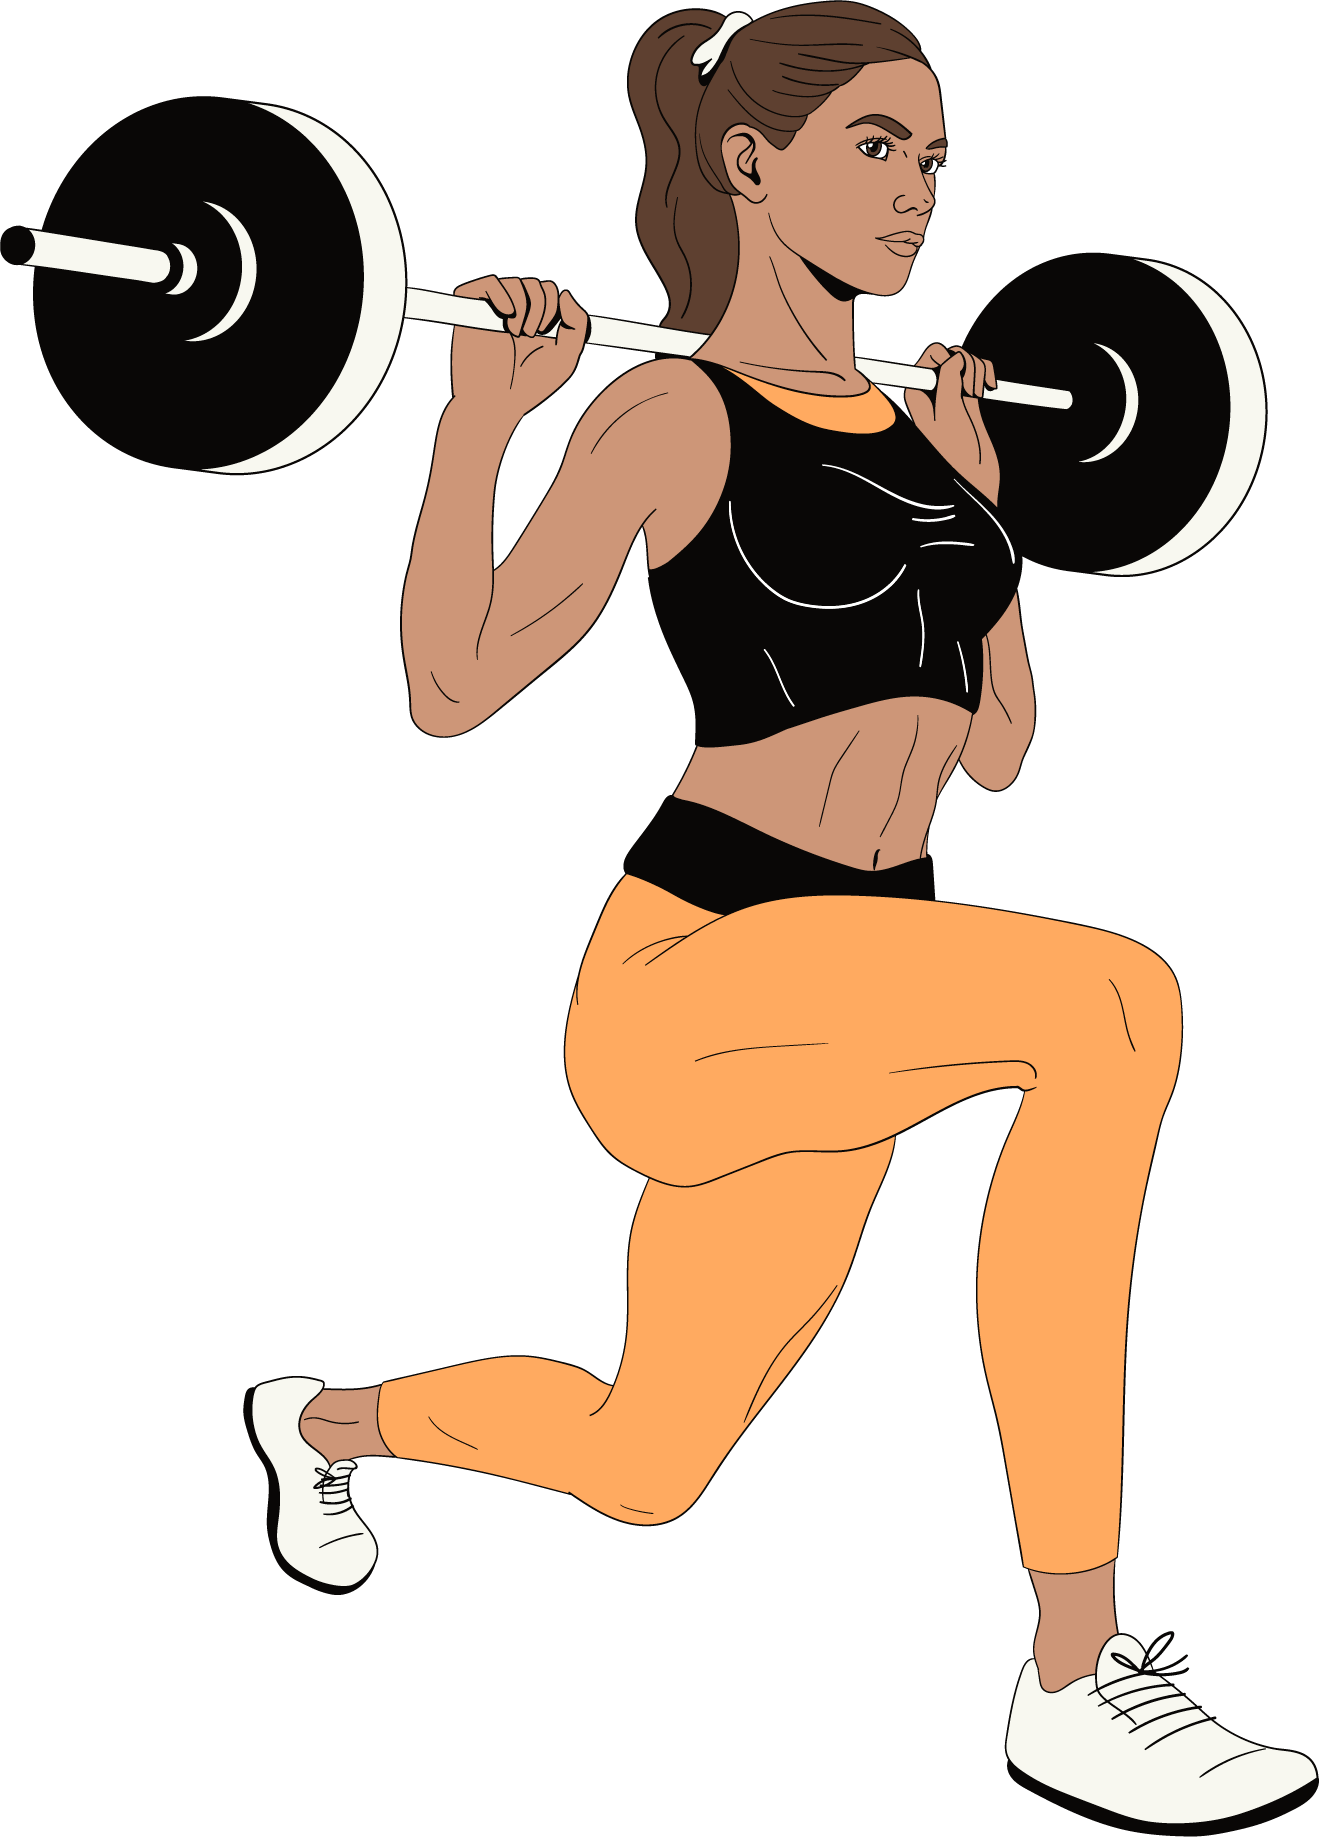 "Een vrouw gaat sporten om haar ex te vergeten"" width=""400"" height=""557"" srcset=""https://seduction-positive.fr/wp-content/uploads/2021/04/1619003204_923_Comment-est-ce-que-je-le-recupere-17-etapes-pour-recuperer.png 1319w, https://mannengeheim.nl/wp-content/uploads/2020/05/Ga-sporten-215x300.png 215w, https://mannengeheim.nl/wp-content/uploads/2020/05/Ga-sporten-735x1024.png 735w, https://mannengeheim.nl/wp-content/uploads/2020/05/Ga-sporten-108x150.png 108w, https://mannengeheim.nl/wp-content/uploads/2020/05/Ga-sporten-1103x1536.png 1103w, https://mannengeheim.nl/wp-content/uploads/2020/05/Ga-sporten-47x65.png 47w, https://mannengeheim.nl/wp-content/uploads/2020/05/Ga-sporten-158x220.png 158w, https://mannengeheim.nl/wp-content/uploads/2020/05/Ga-sporten-72x100.png 72w, https://mannengeheim.nl/wp-content/uploads/2020/05/Ga-sporten-287x400.png 287w, https://mannengeheim.nl/wp-content/uploads/2020/05/Ga-sporten-323x450.png 323w, https://mannengeheim.nl/wp-content/uploads/2020/05/Ga-sporten-366x510.png 366w"" sizes=""(max-width: 400px) 100vw, 400px"